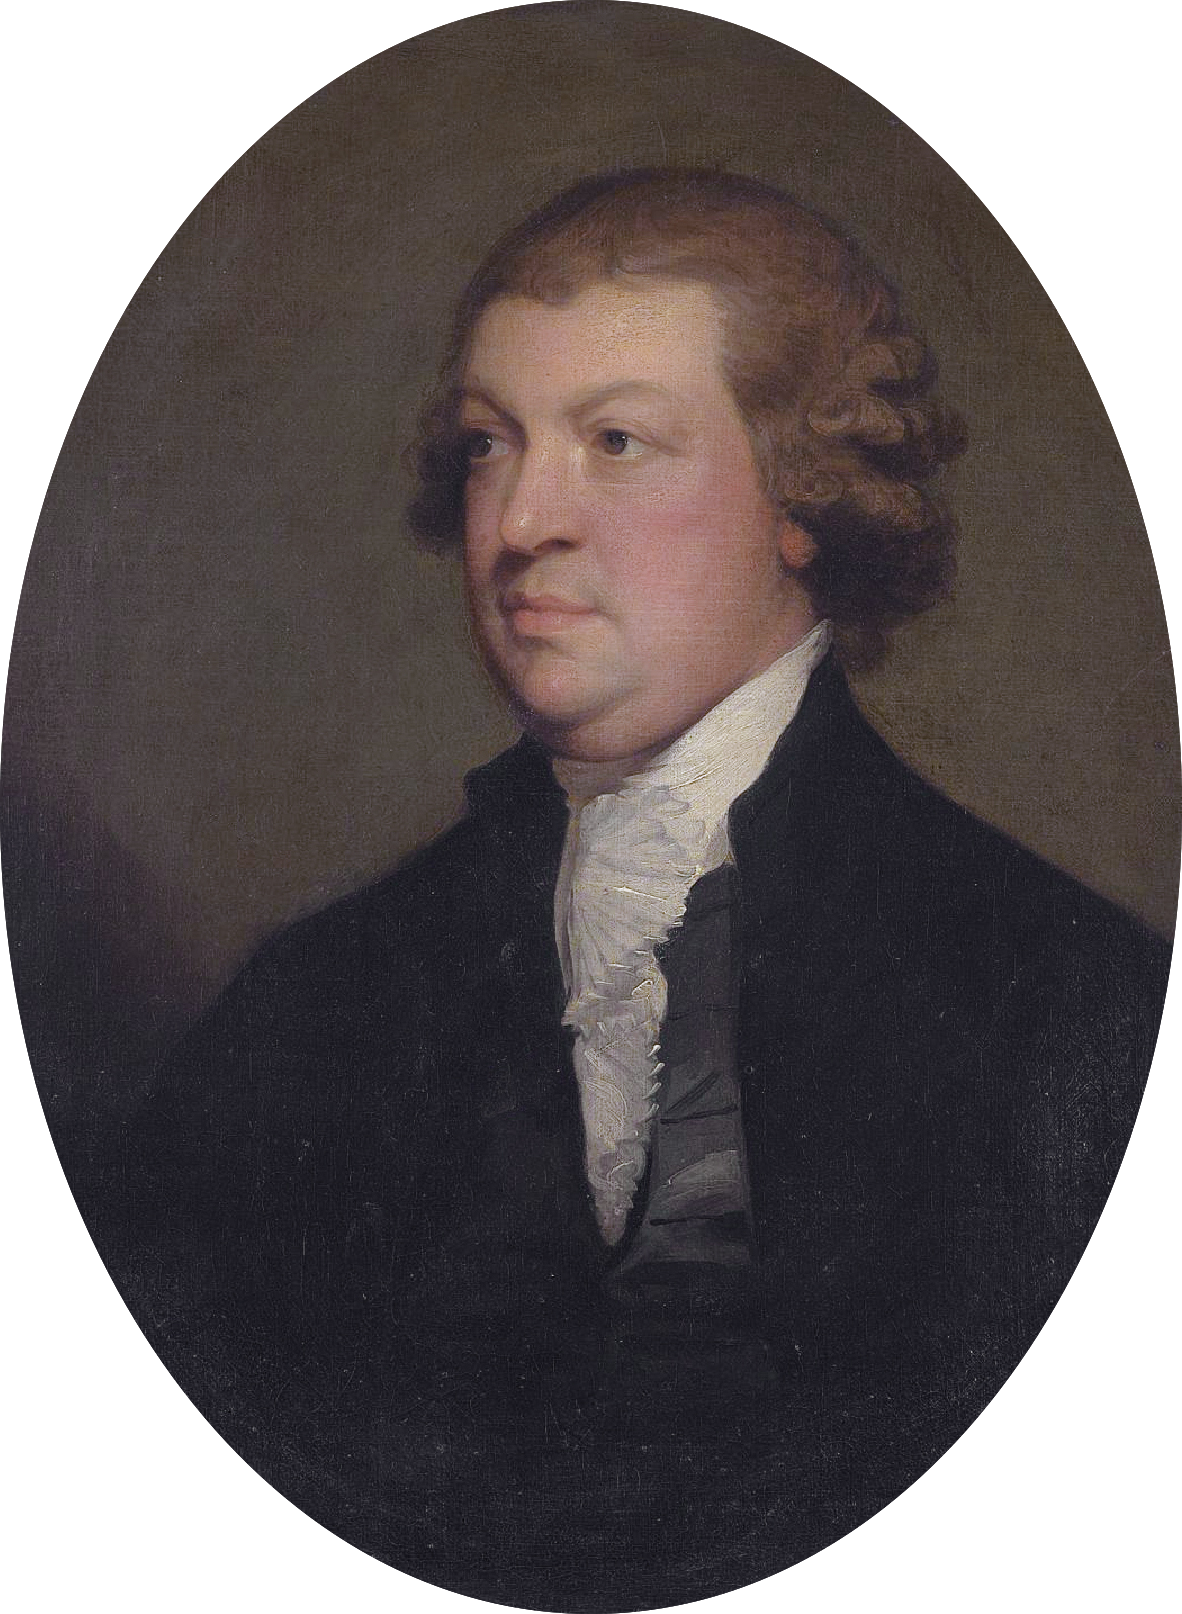 John Scott, 1st Earl of Clonmell, by Gilbert Stuart. Oil on canvas, 71.5 x 59 cm. Public Domain.